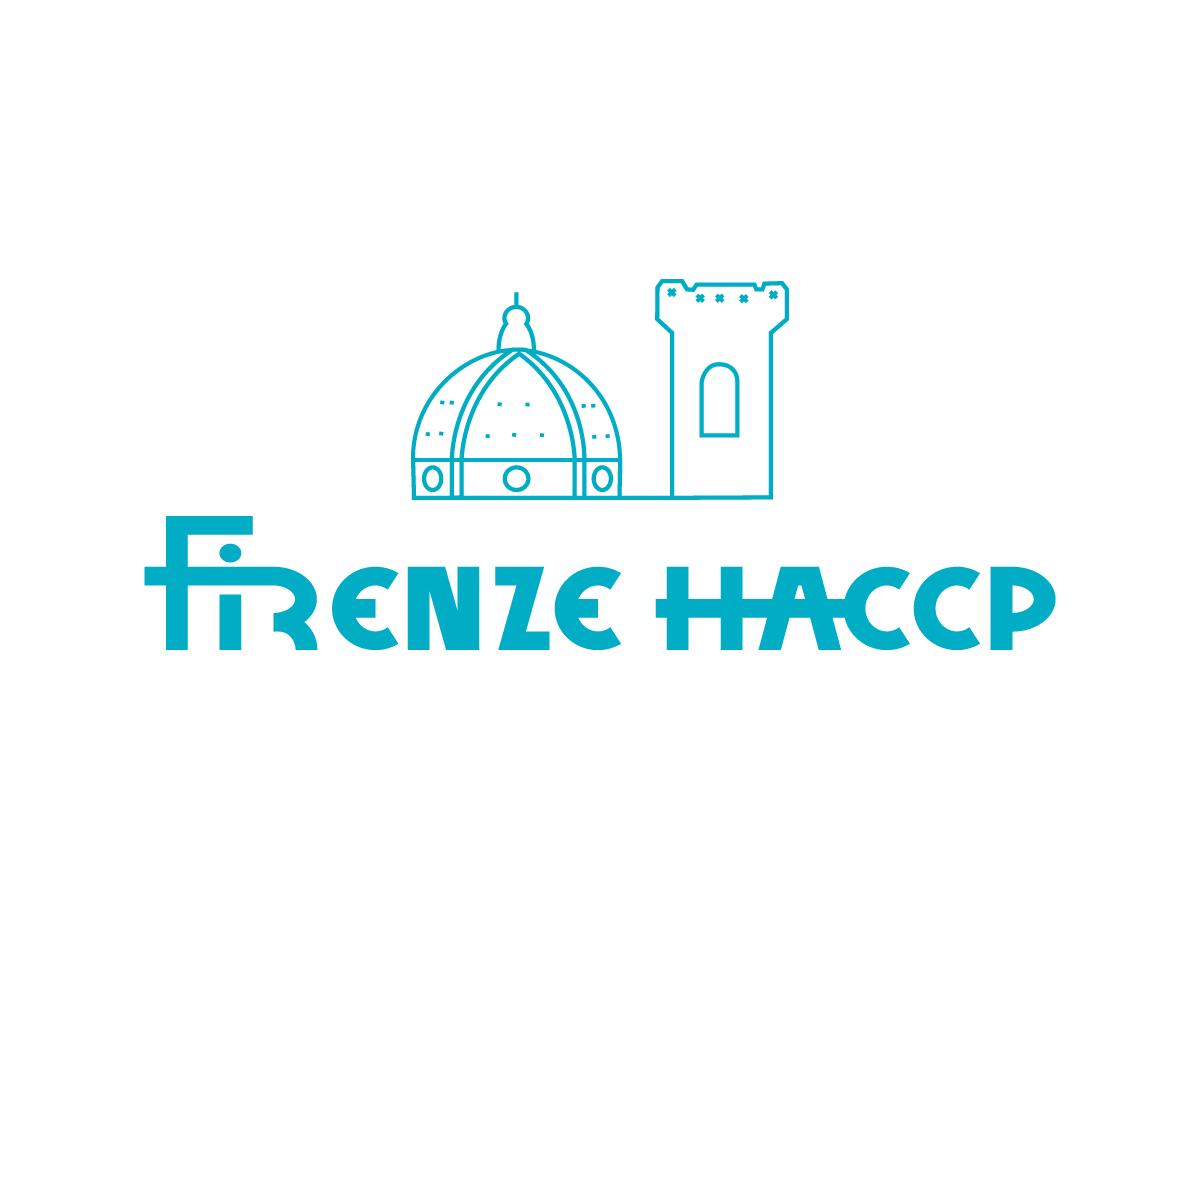 Firenze HACCP – brand design